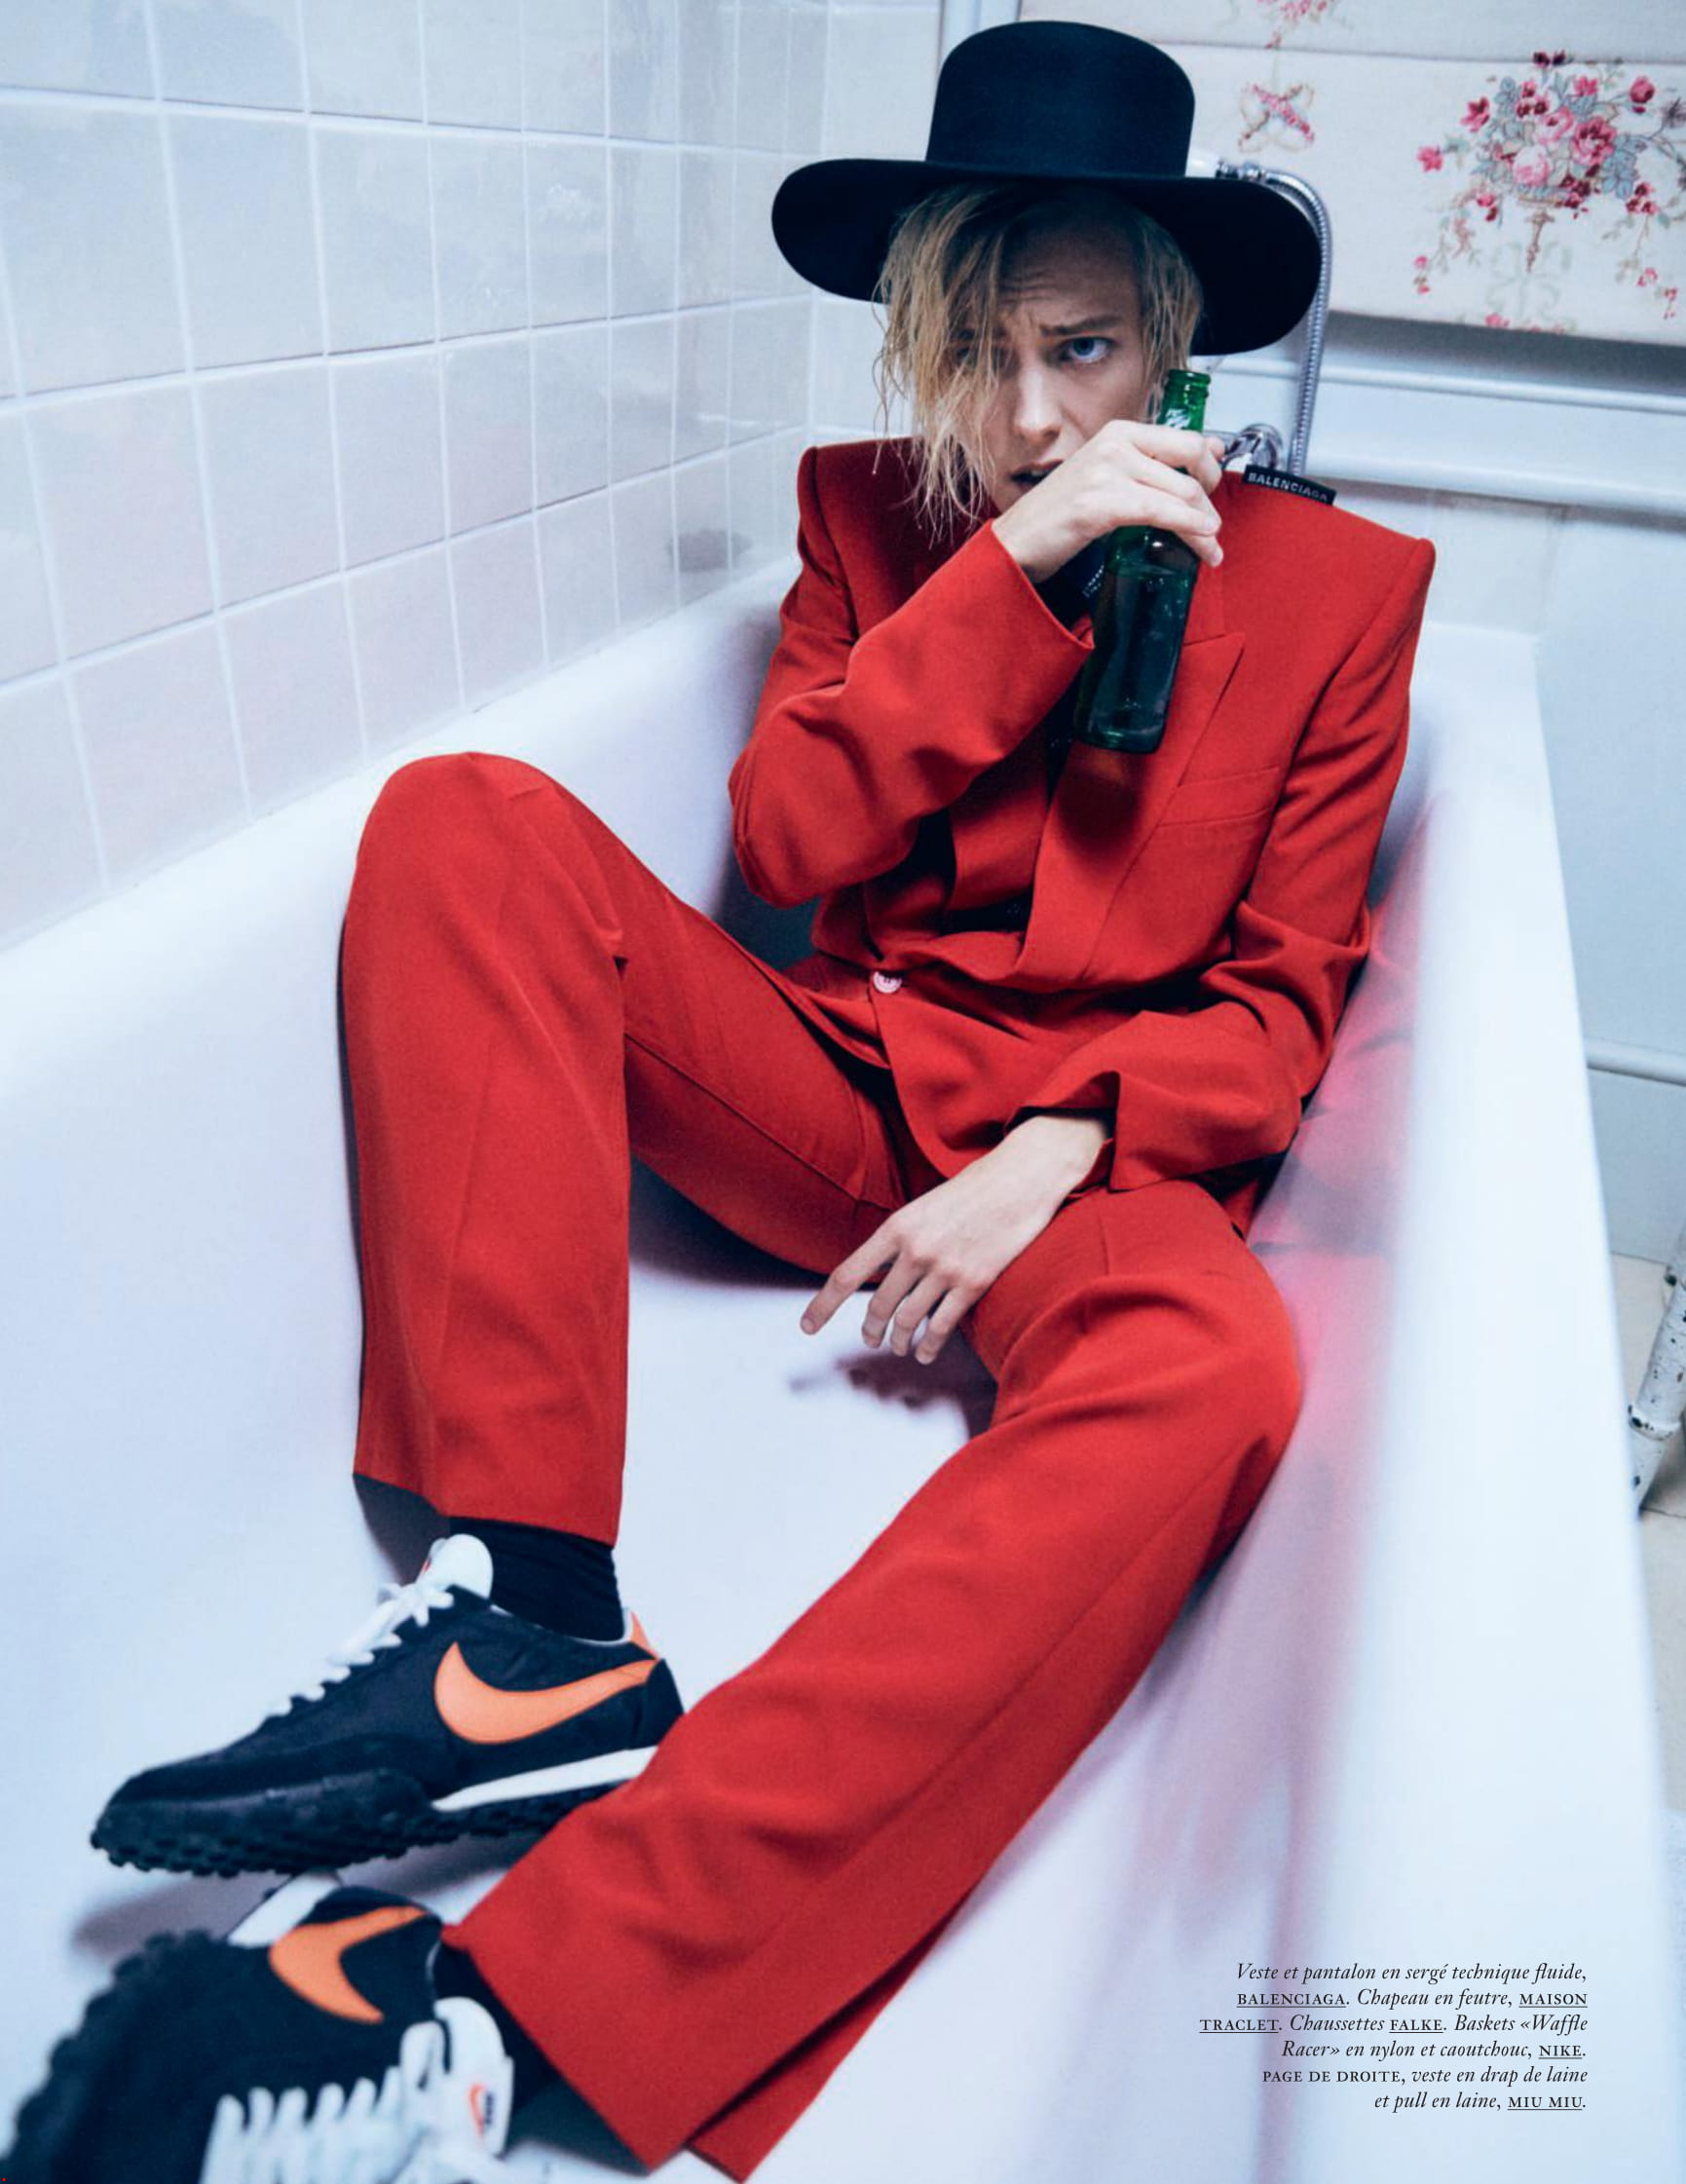 Erika Linder by Mikael Jansson for Vogue Paris Feb 2019 (14).jpg